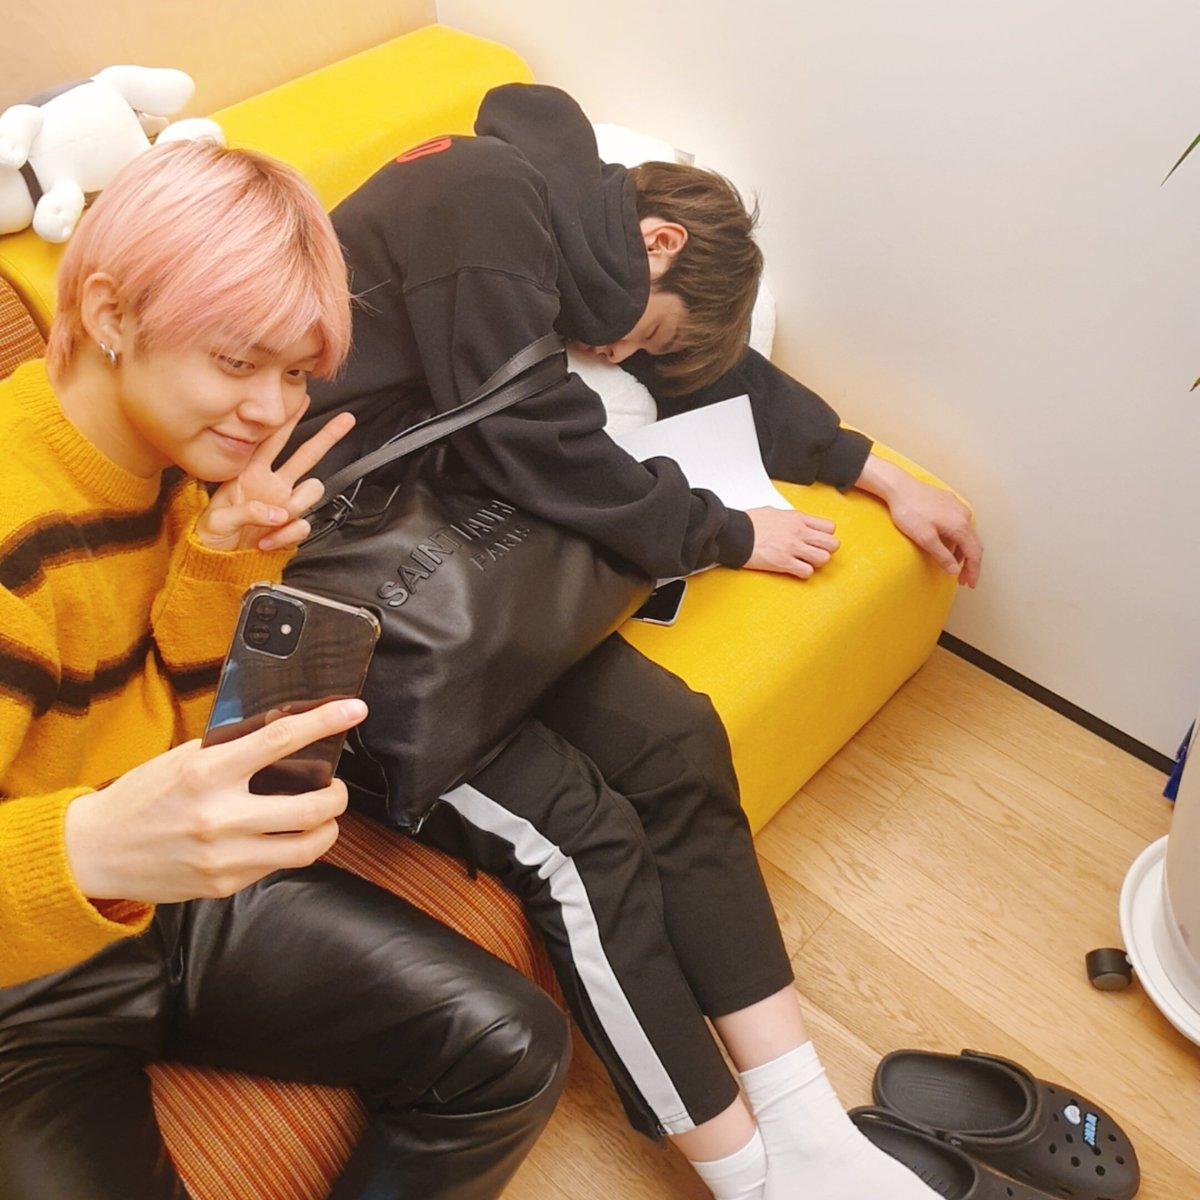 @TXT_members's photo on soobin